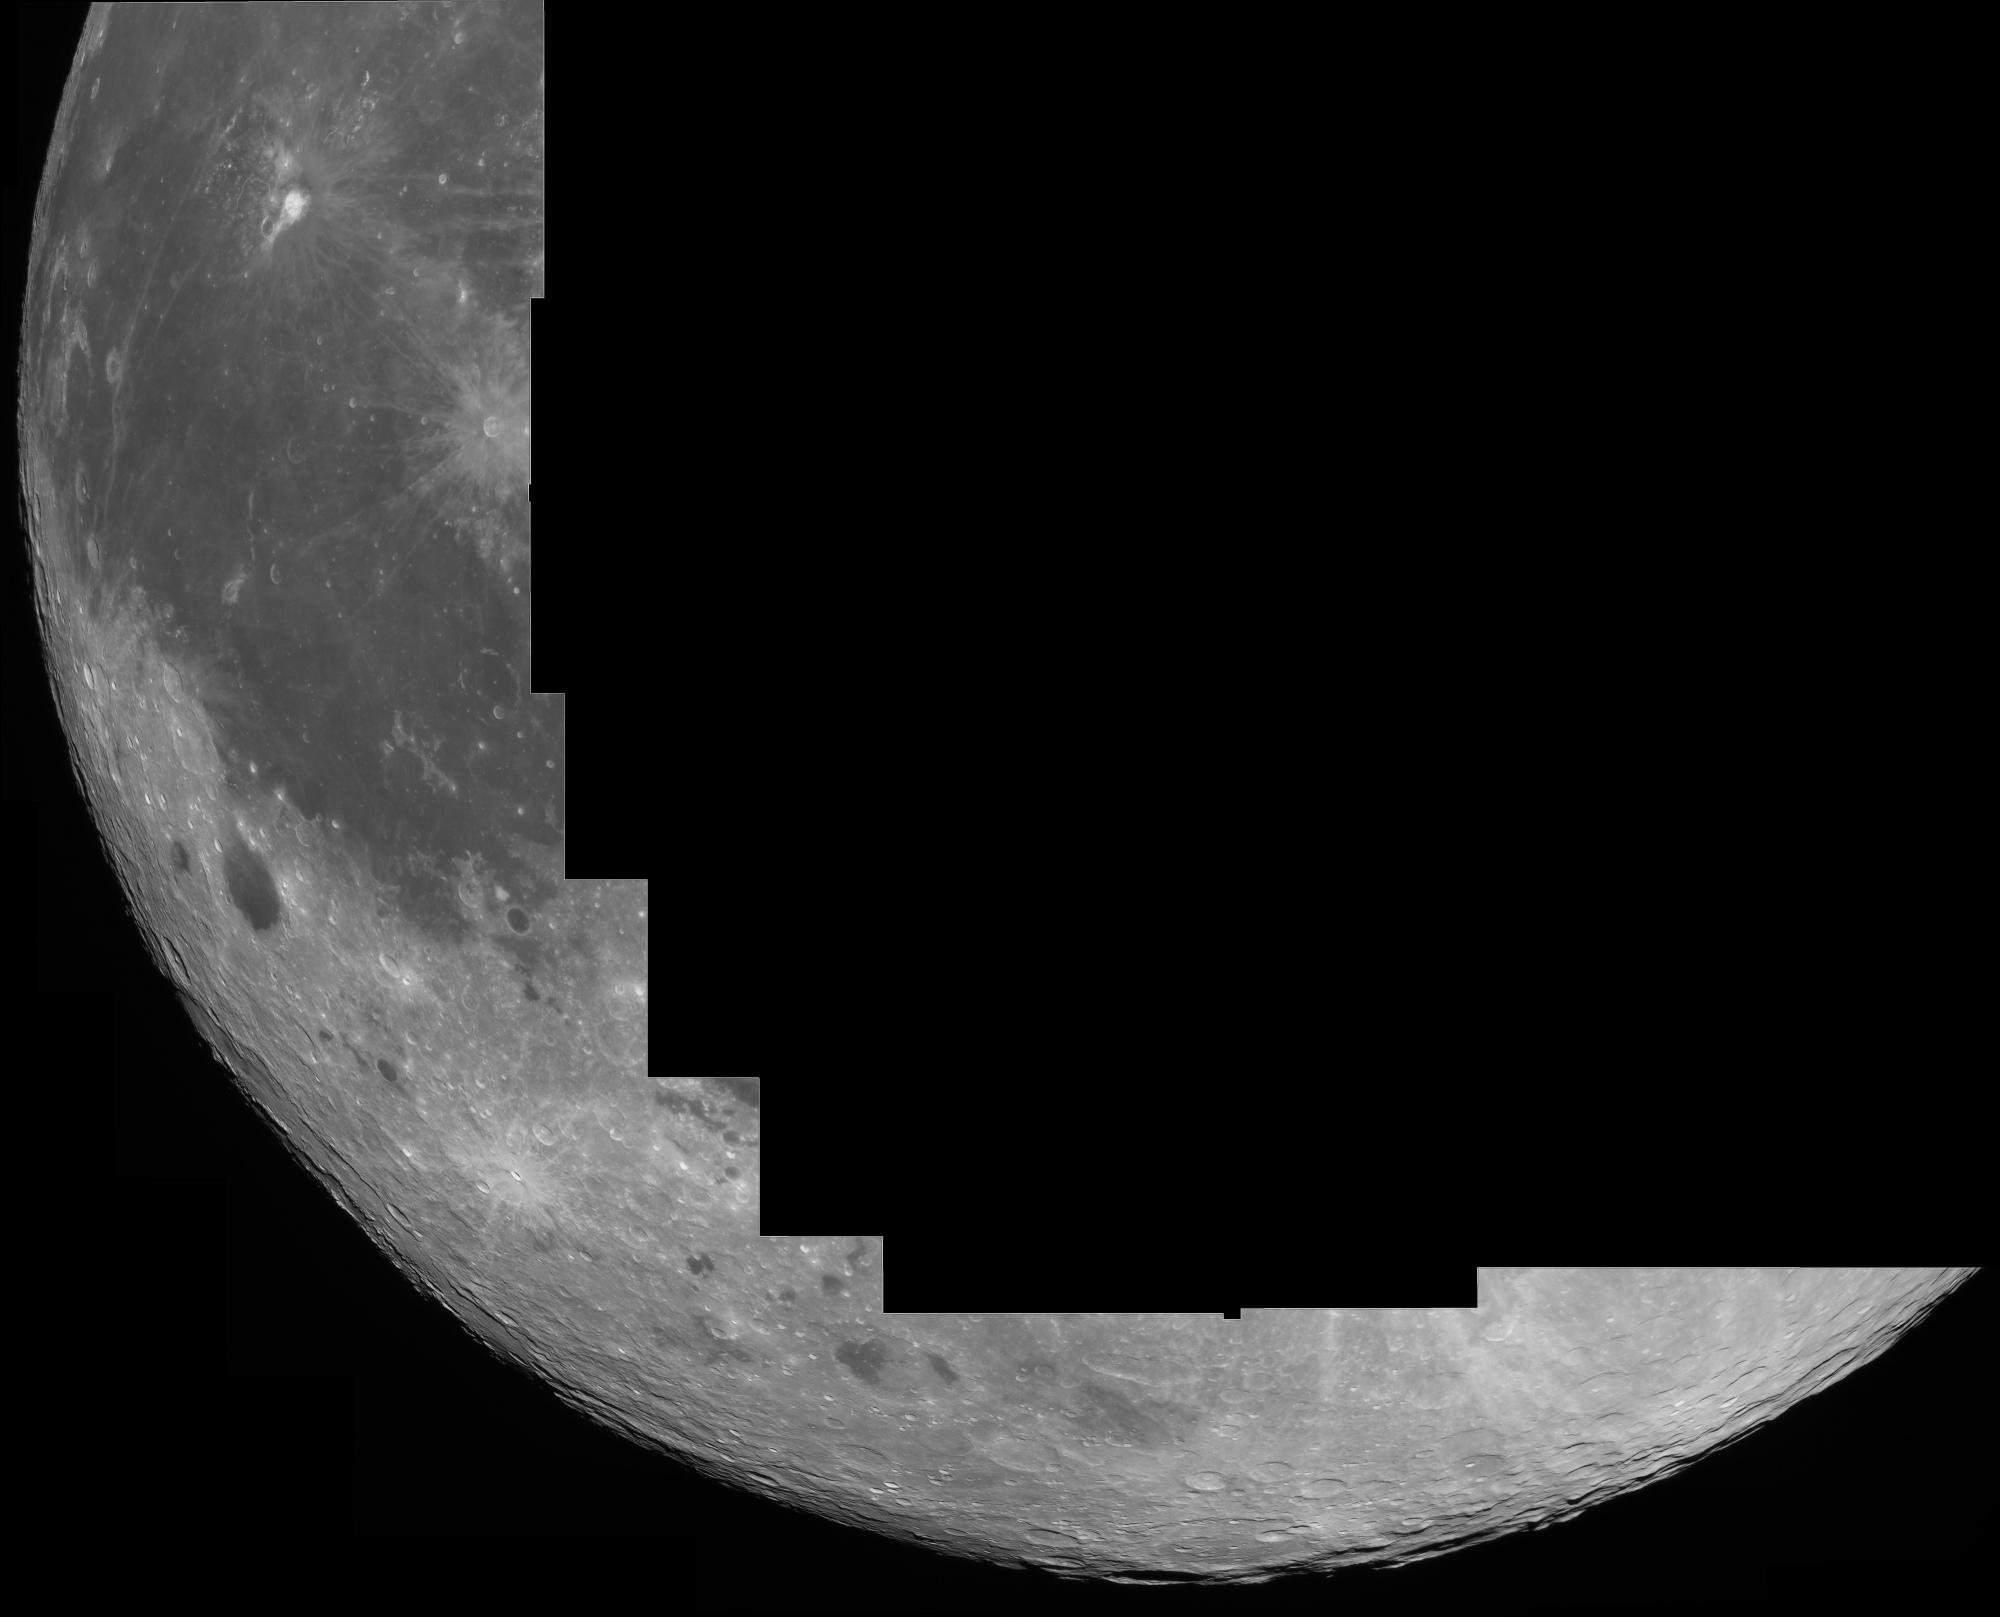 2021-02-26-2129_4-Moon_AS_P25_lapl6_ap2652_stitch.thumb.jpg.eee01b6ee8bc2857d3d71d60a07d0916.jpg